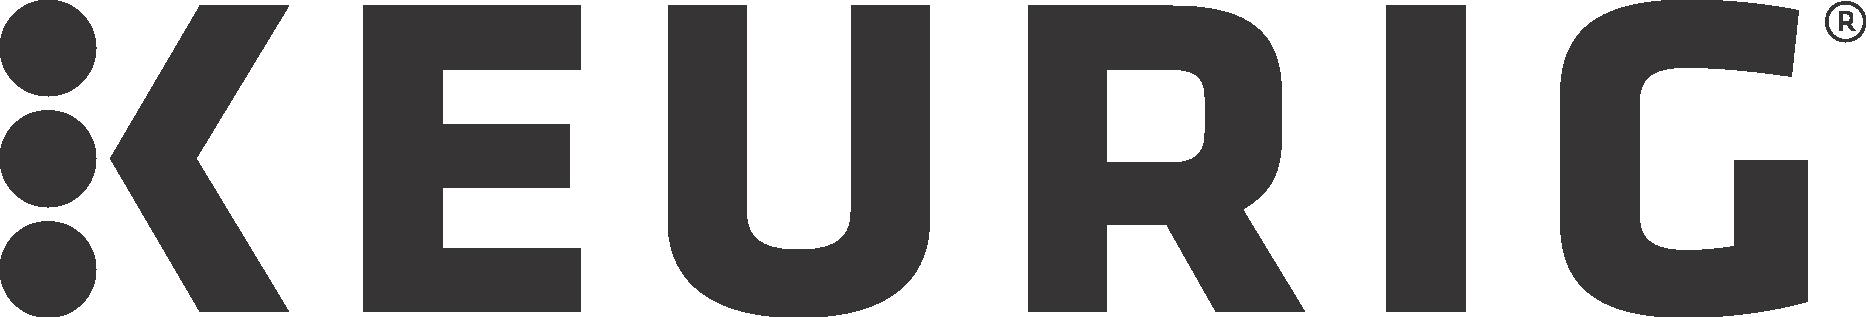 Keurig Logo png